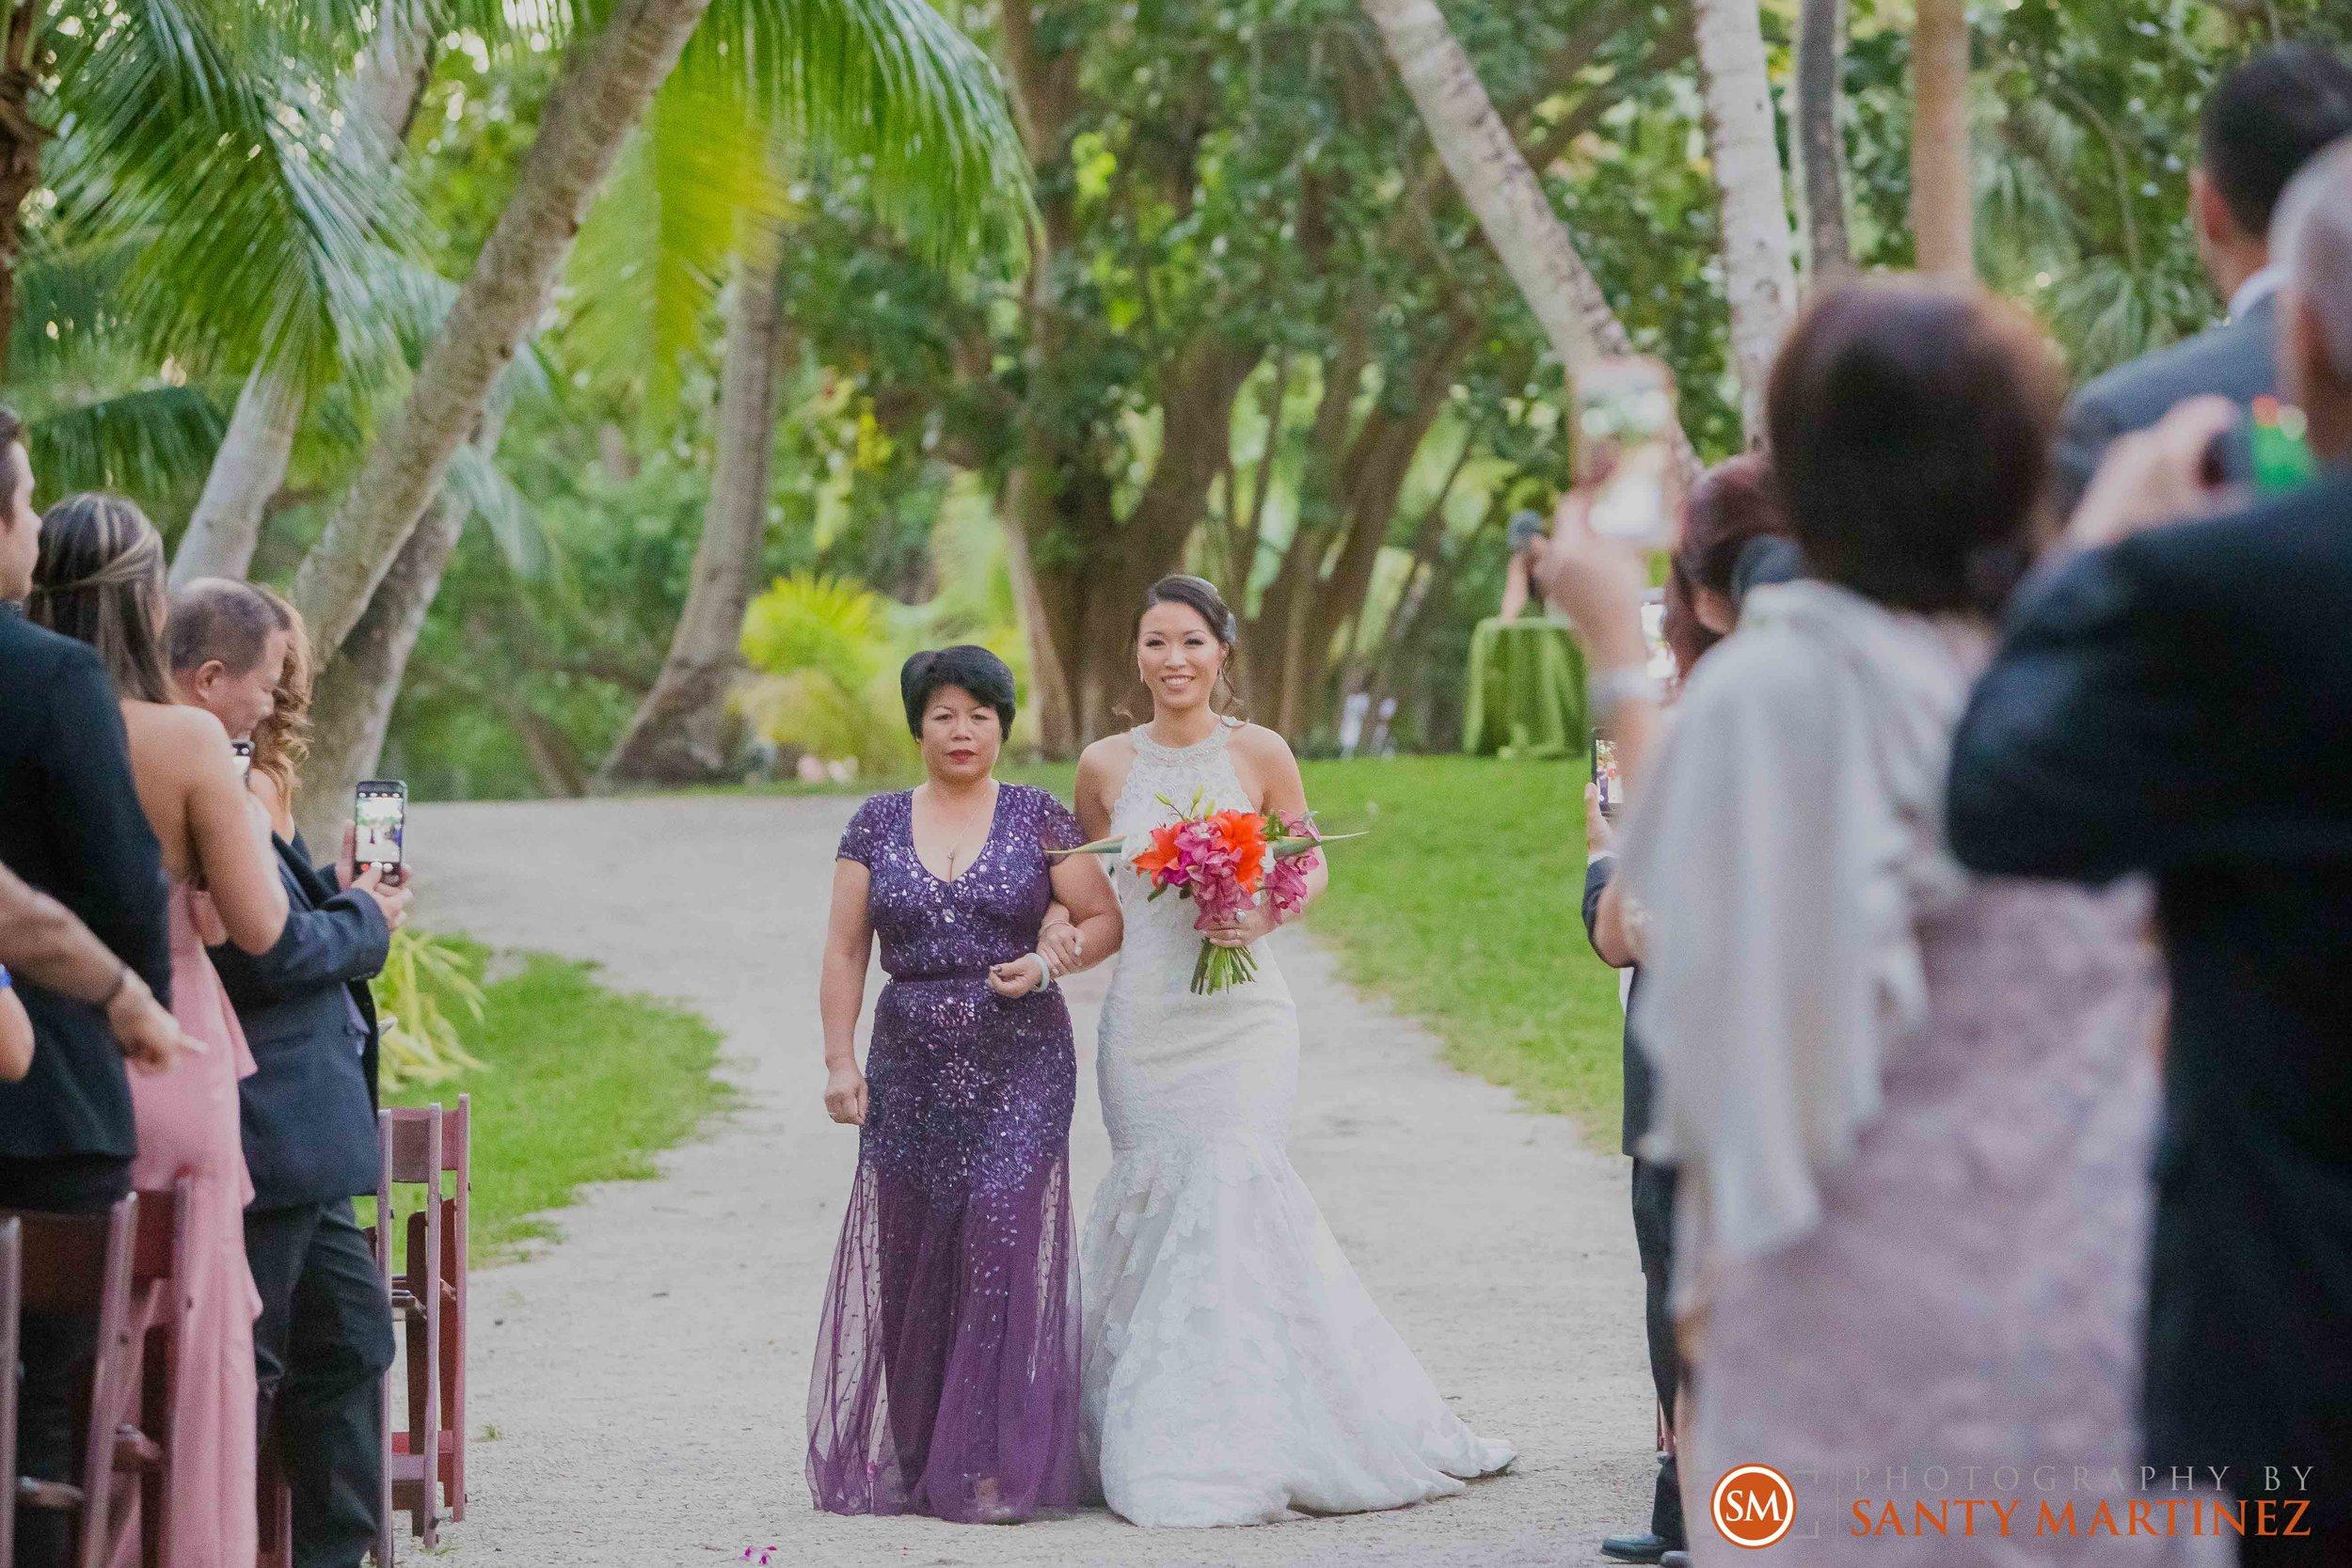 Wedding Bonnet House - Photography by Santy Martinez-26.jpg